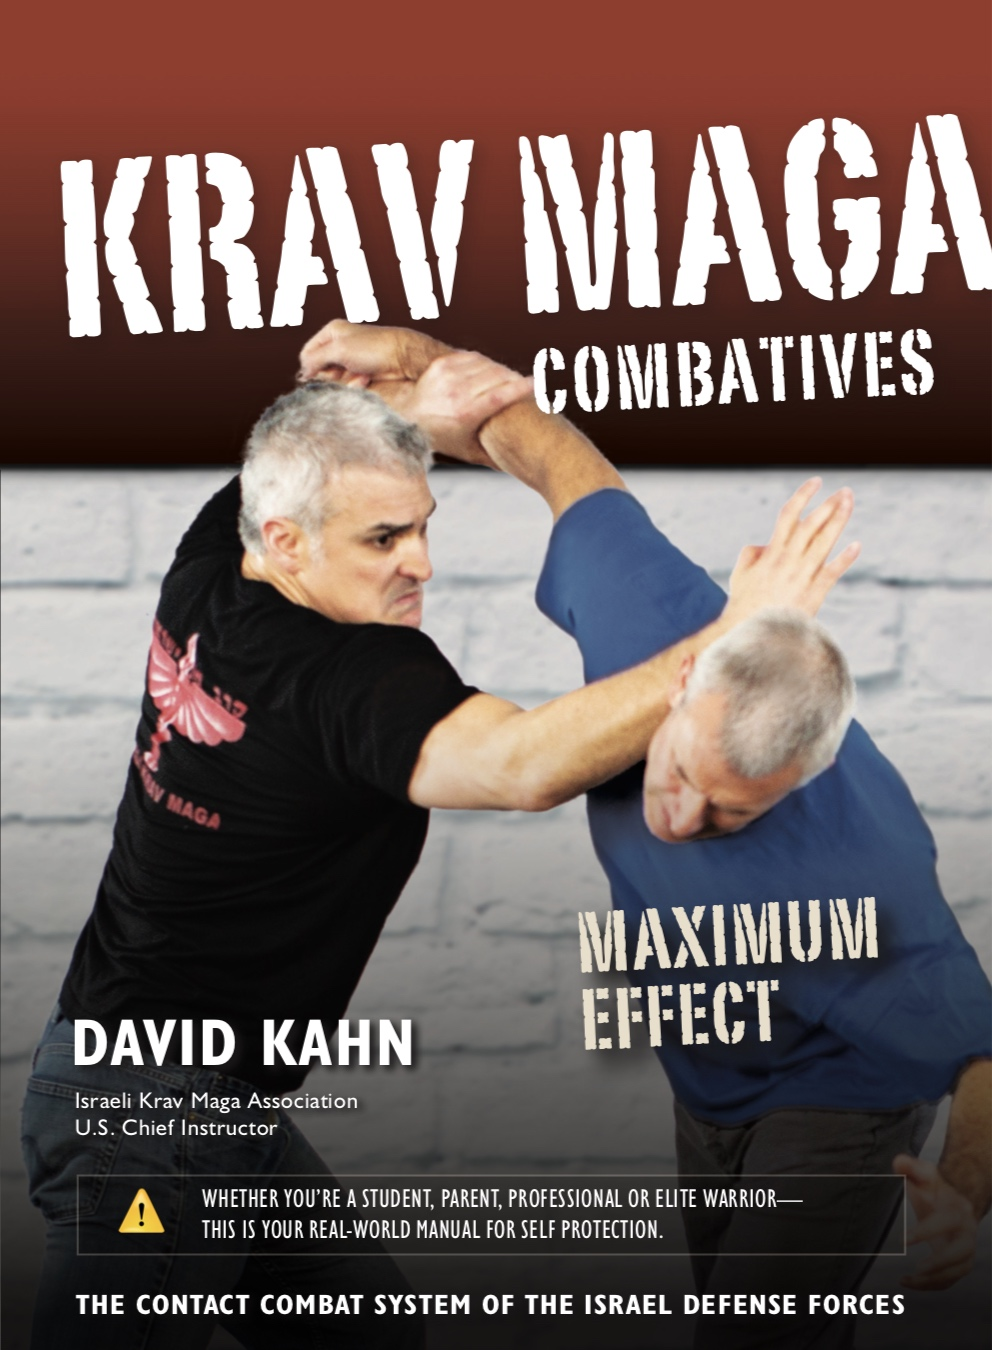 David-Kahn-Krav-Maga-Combatives-Cover.jpg